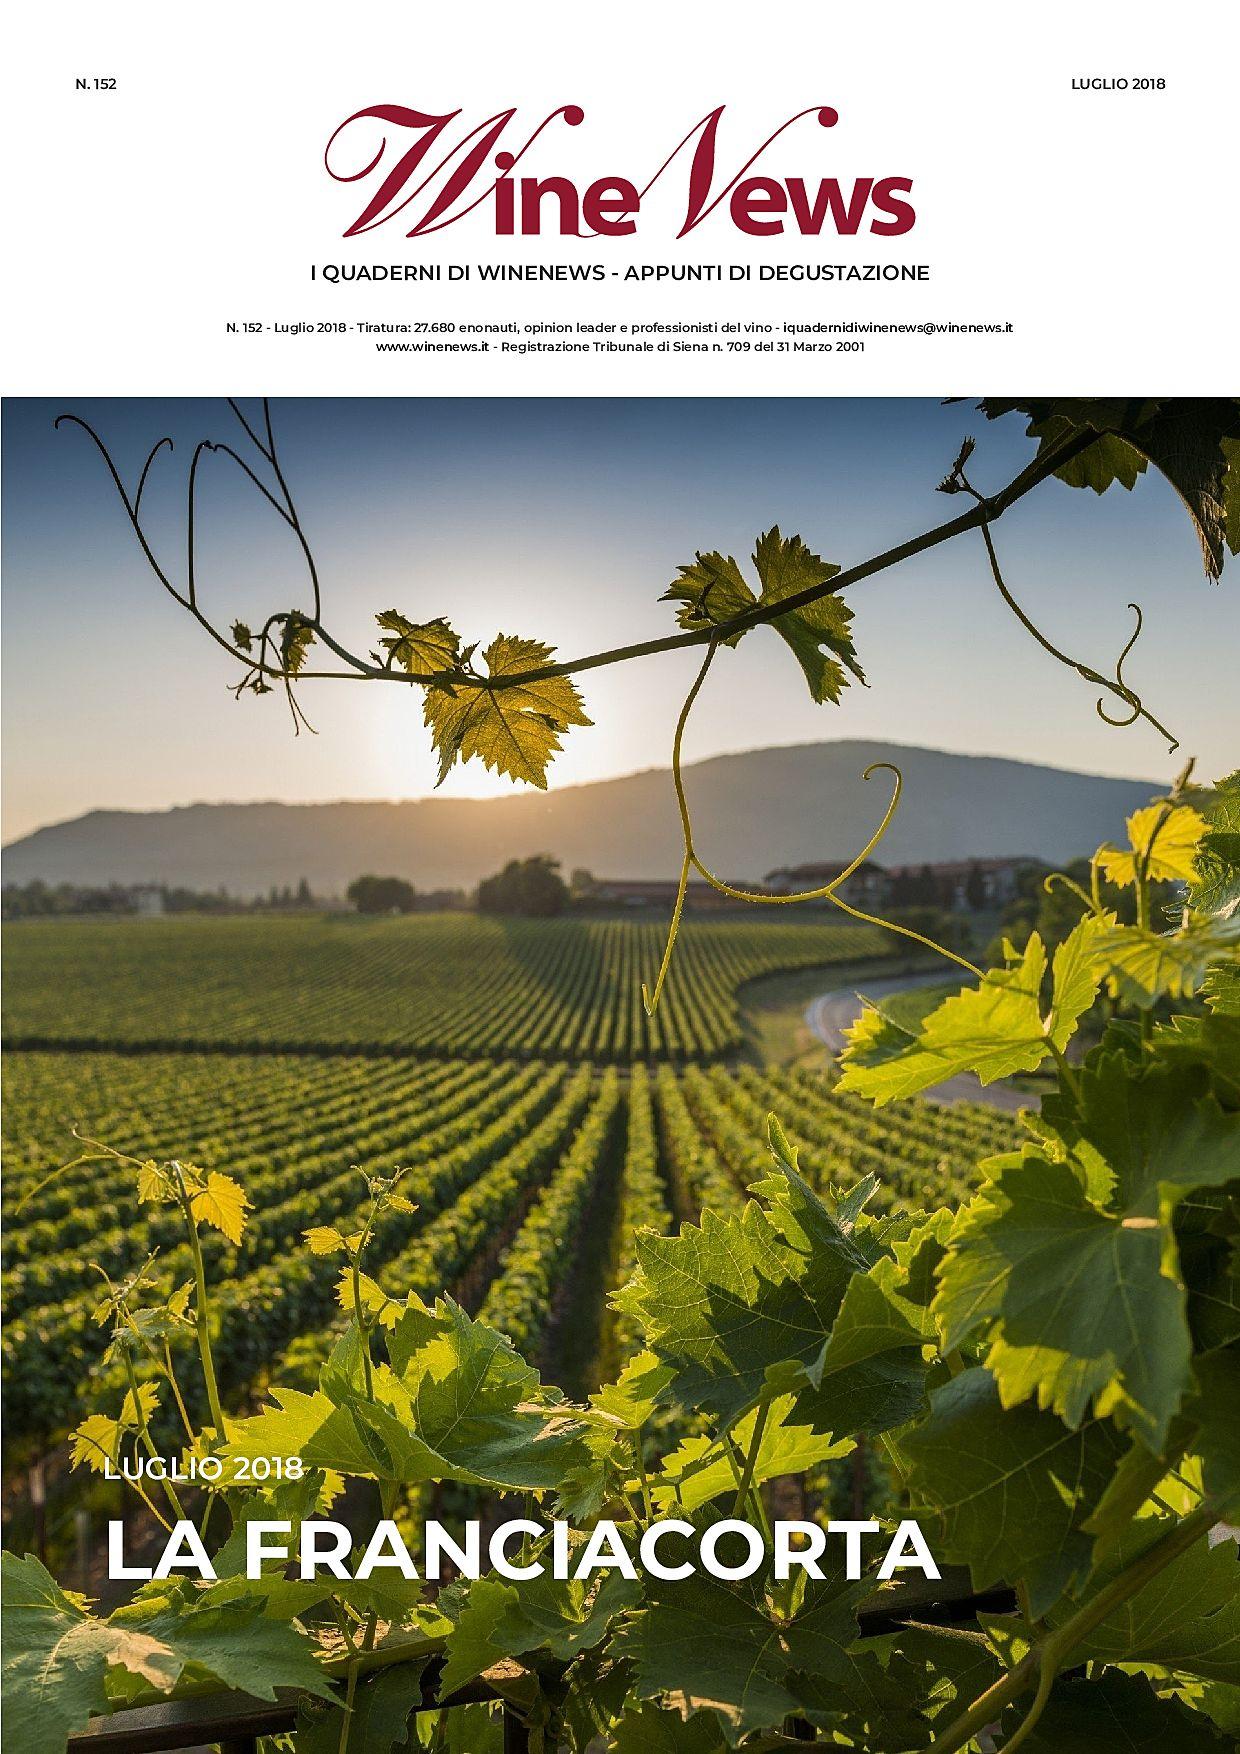 https://winenews.it/php/redirect_pdf.php?id=368640&t=1531566660